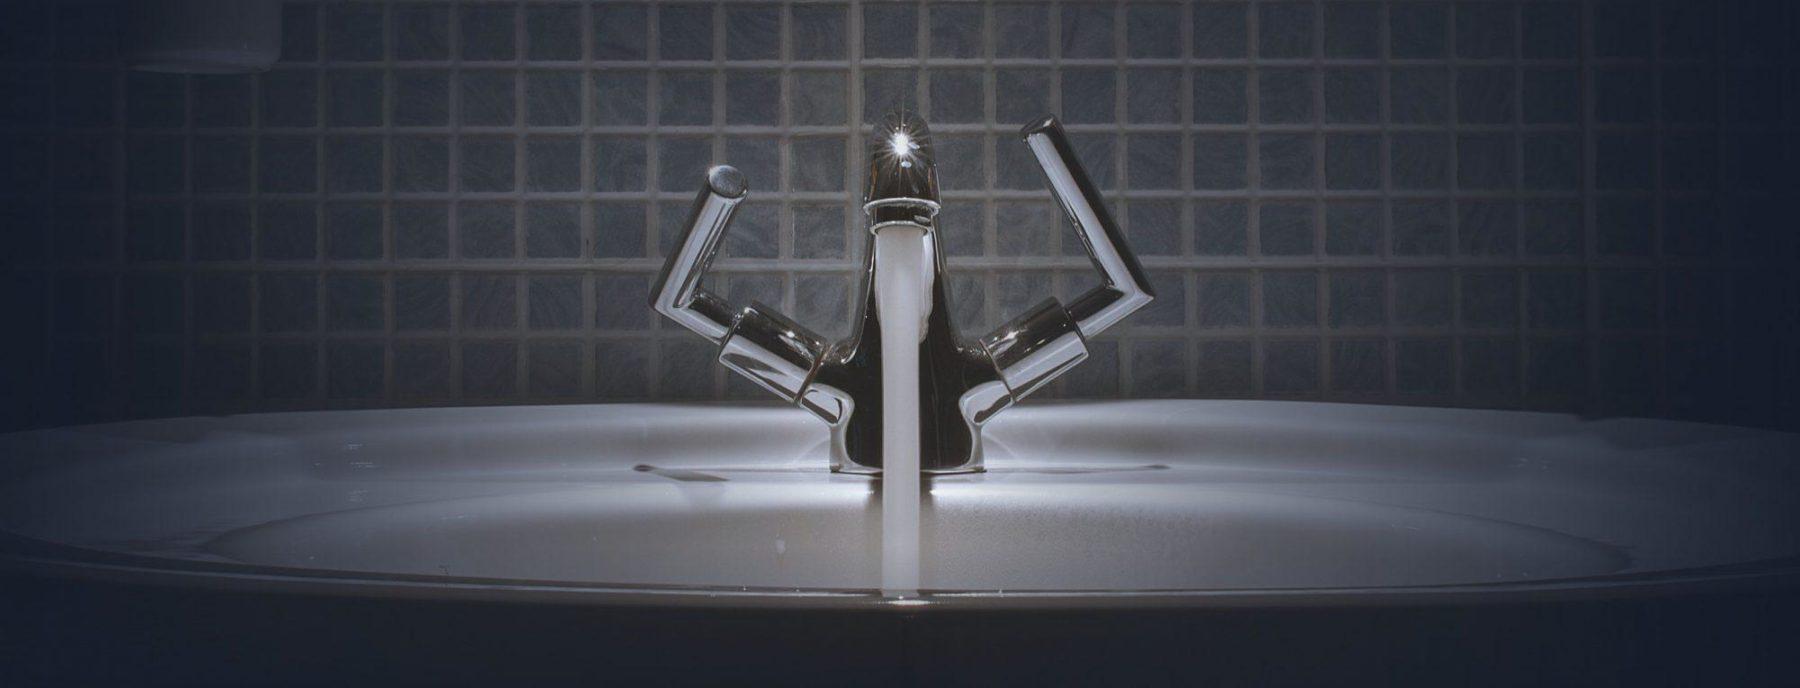 Brecker Verden Heizung Sanitär